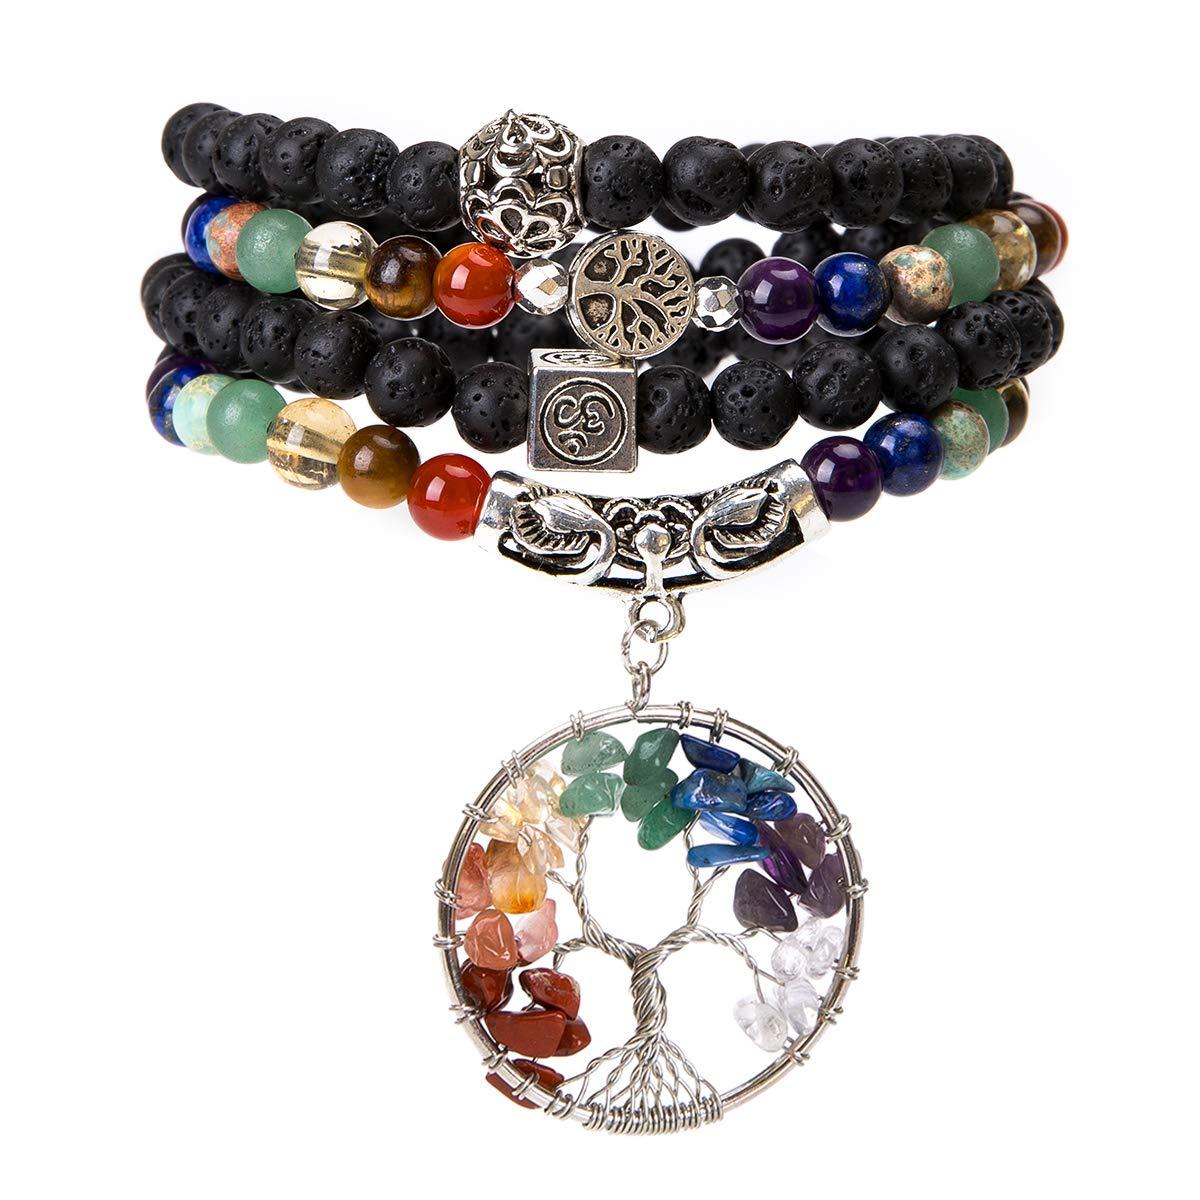 Bivei 108 Mala Beads Bracelet - 7 Chakra Tree of Life Real Healing Gemstone Yoga Meditation Mala Prayer Bead Necklace(Lava Rock Stone) by Bivei